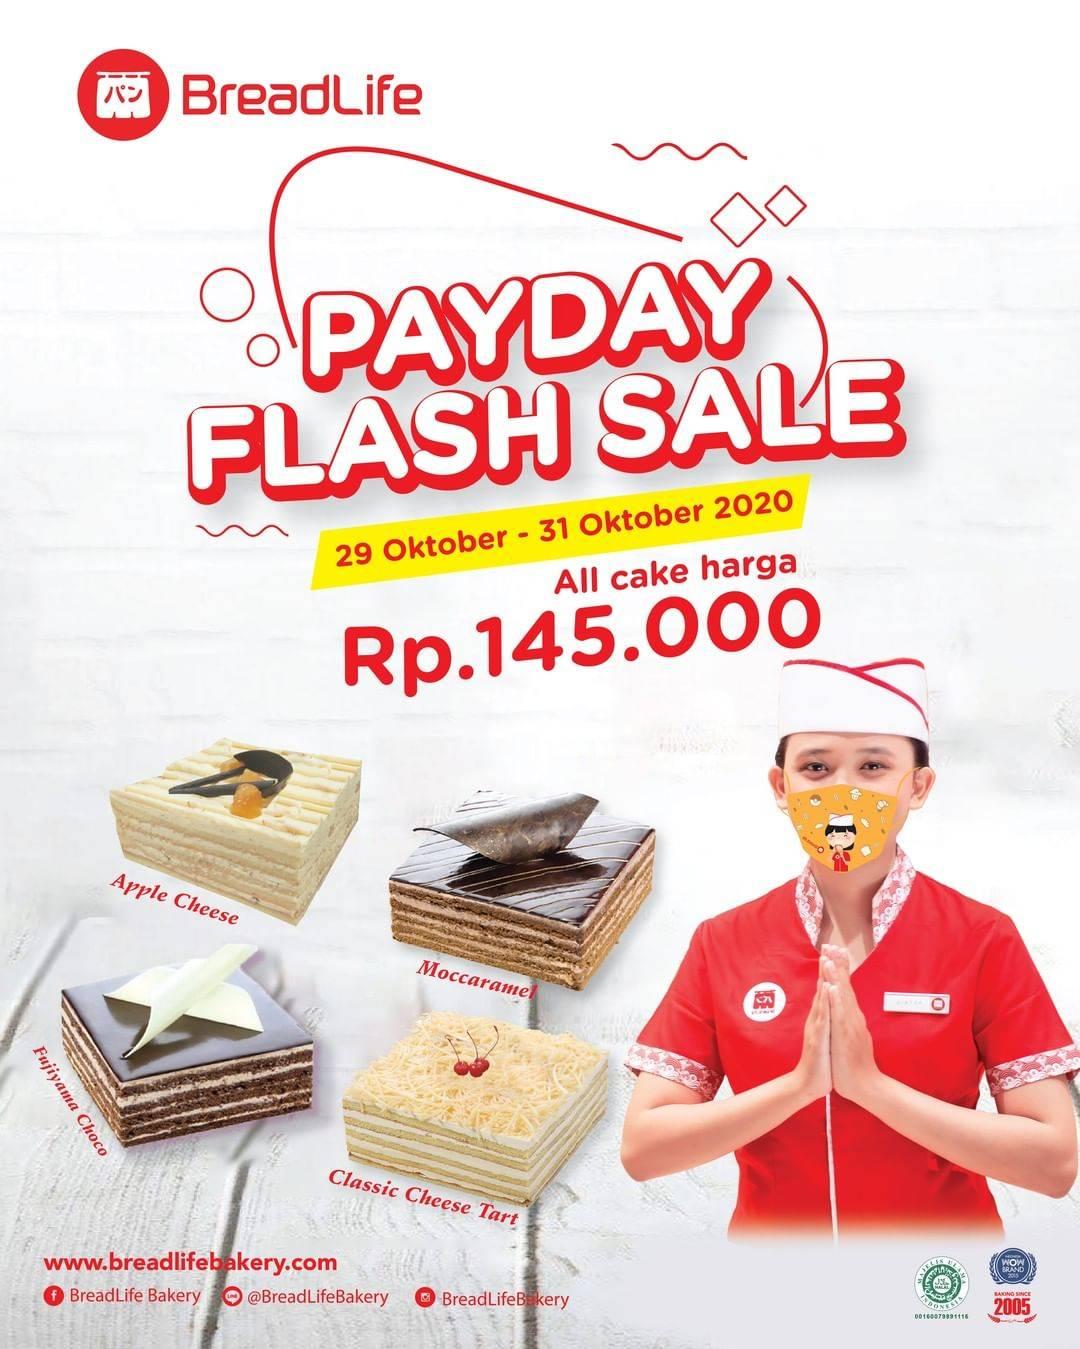 Diskon Breadlife Promo Payday Flash Sale All Cake Hanya Rp. 145.000